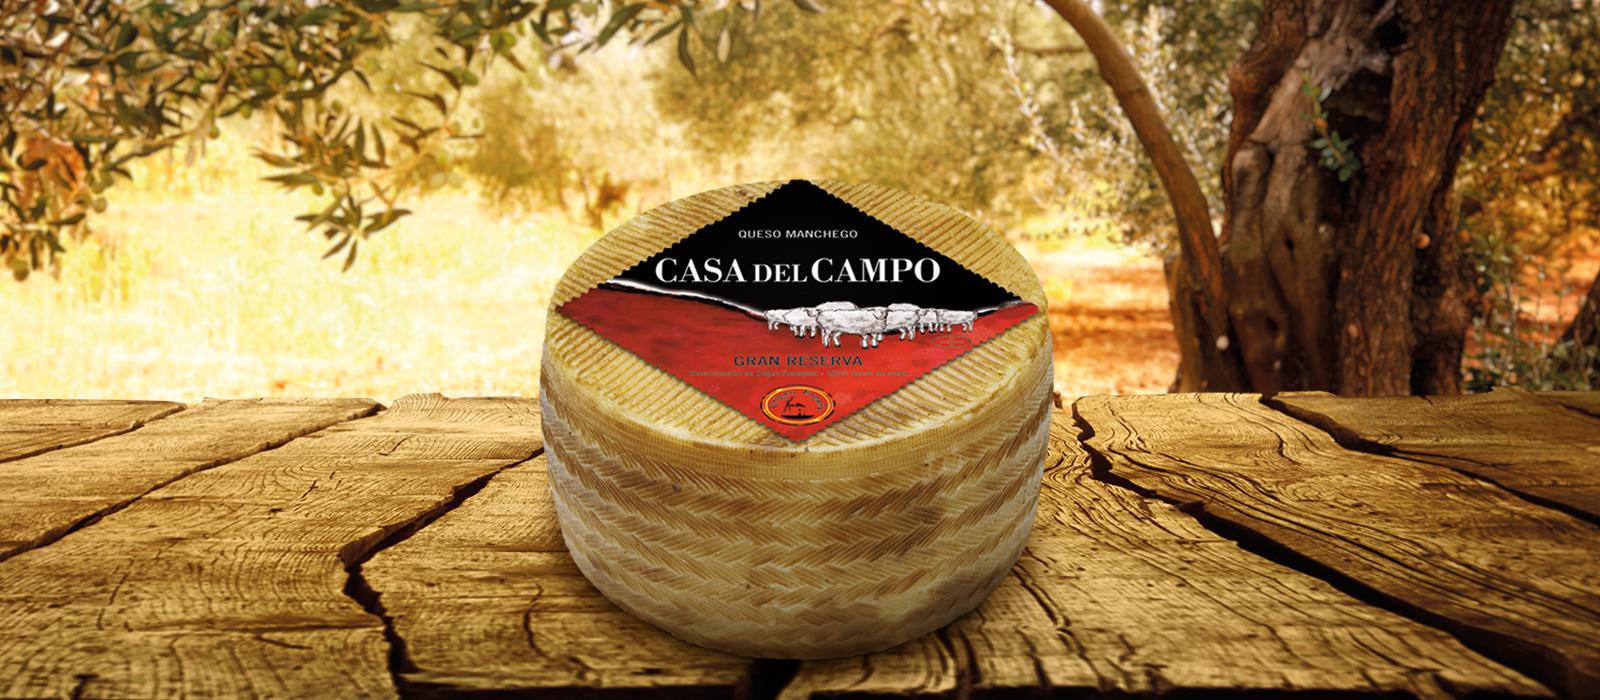 Casa del Campo auf Tisch